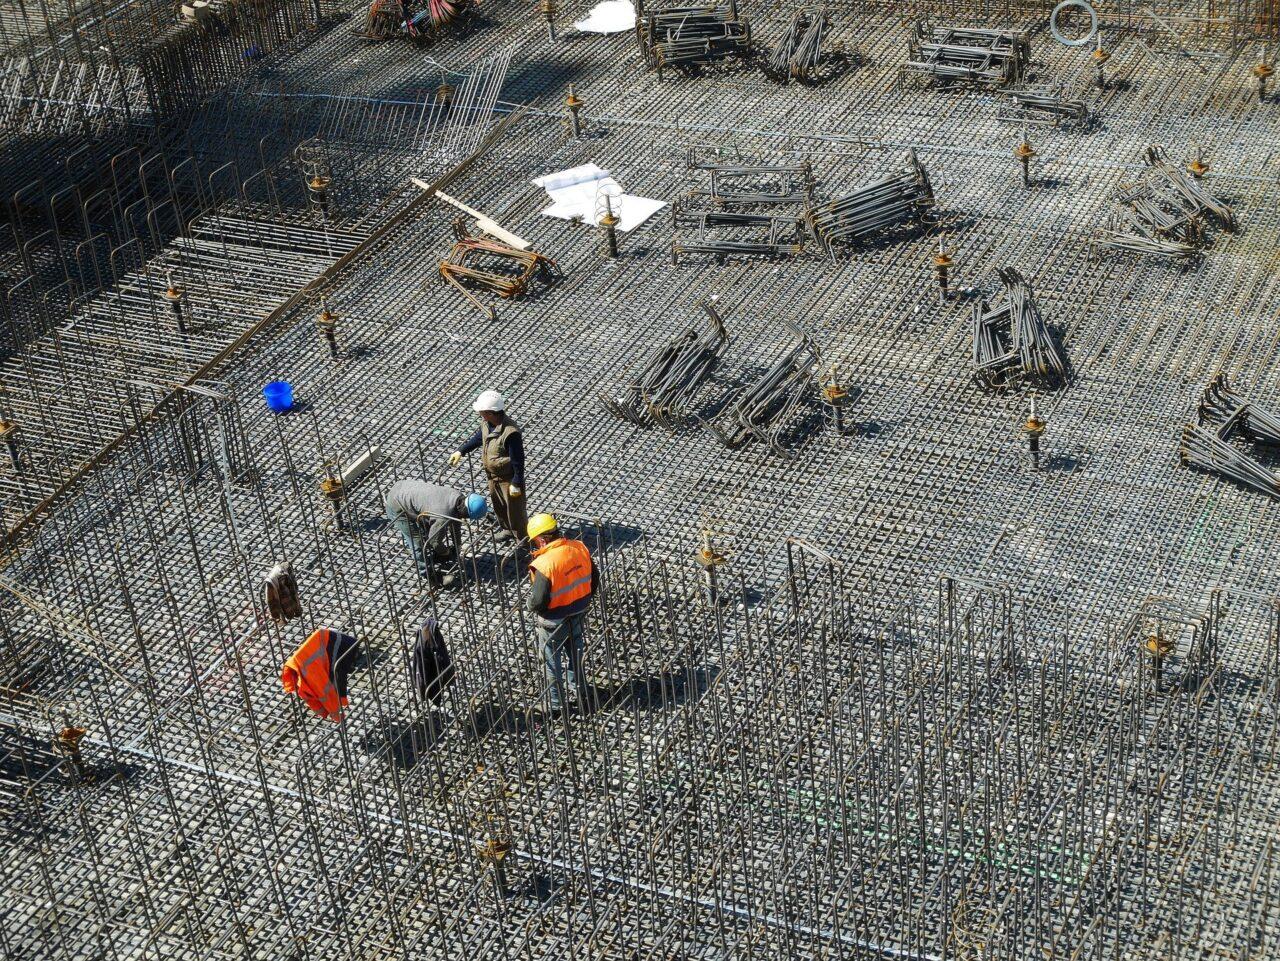 construction-site-1359136_1920-1280x961.jpg